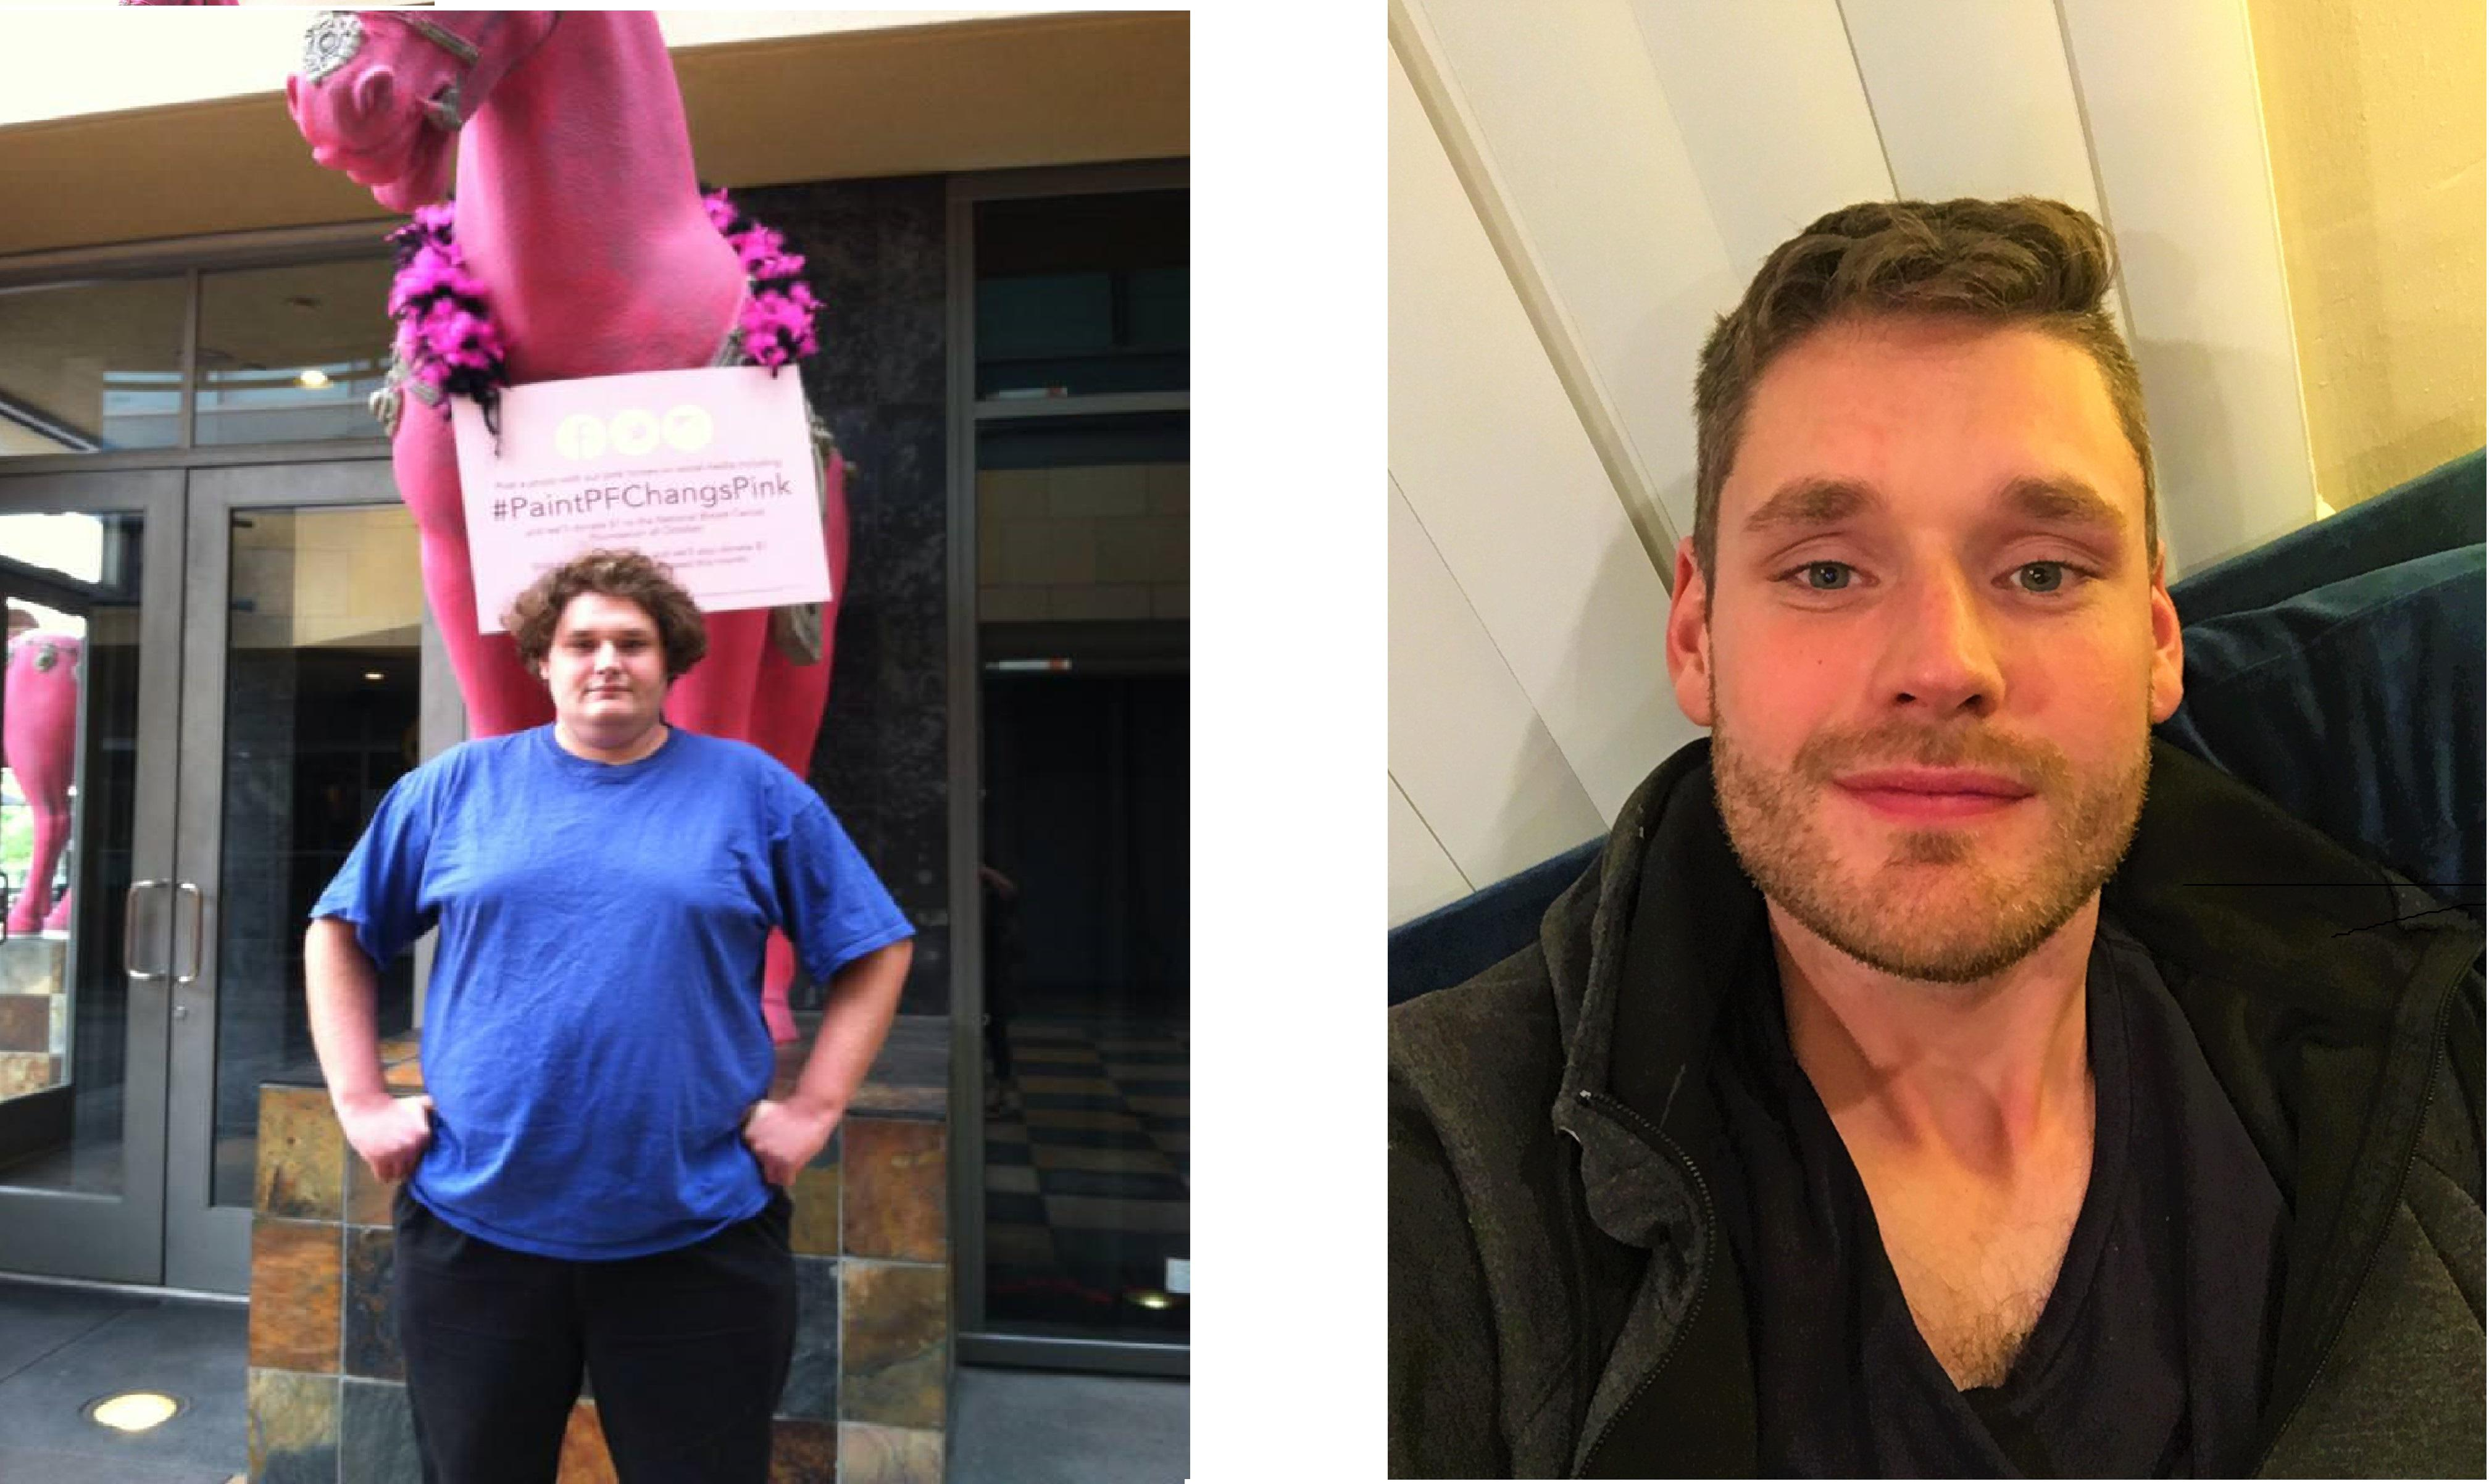 140 lbs Weight Loss 6'5 Male 340 lbs to 200 lbs